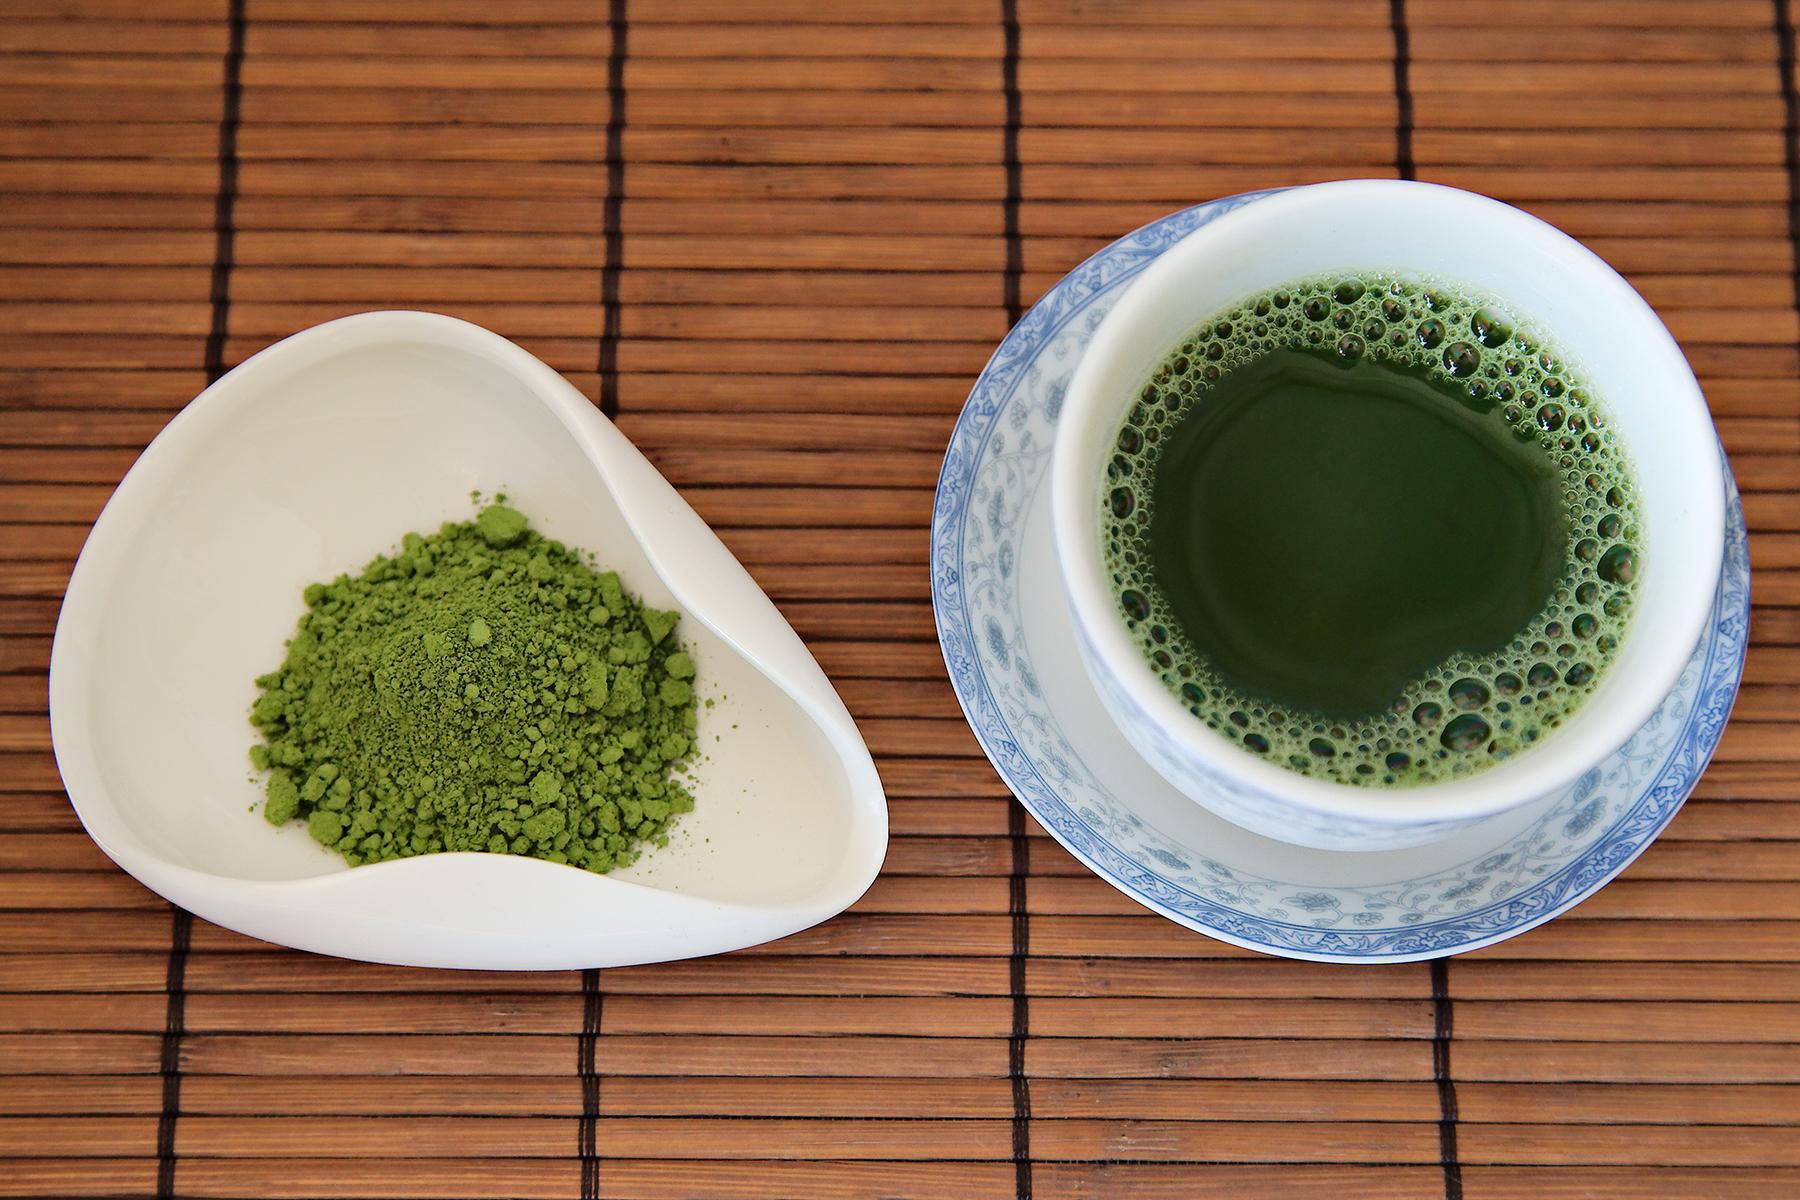 Tea Review - Ito En Koto No Tsuki Matcha